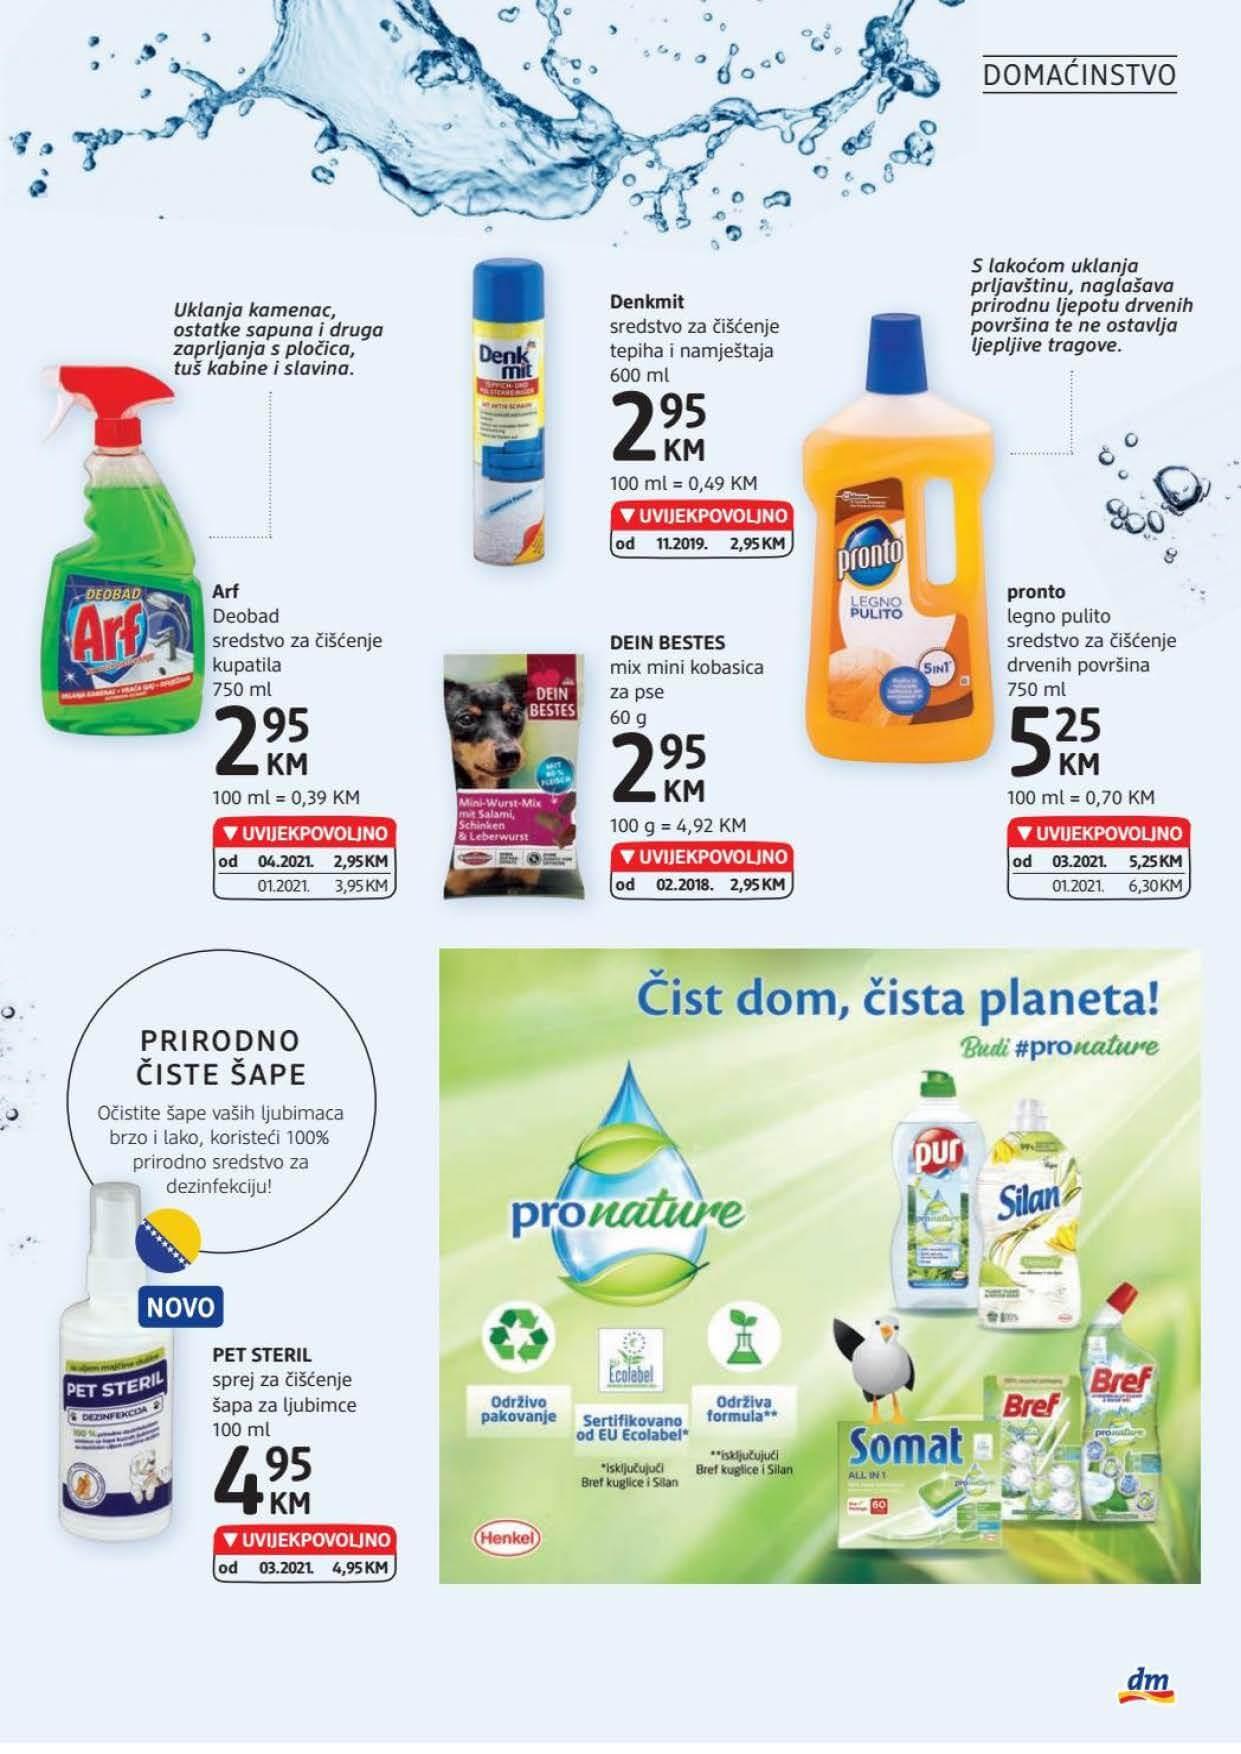 DM Katalog BiH April 2021 14.04.2021. 27.04.2021. Page 07